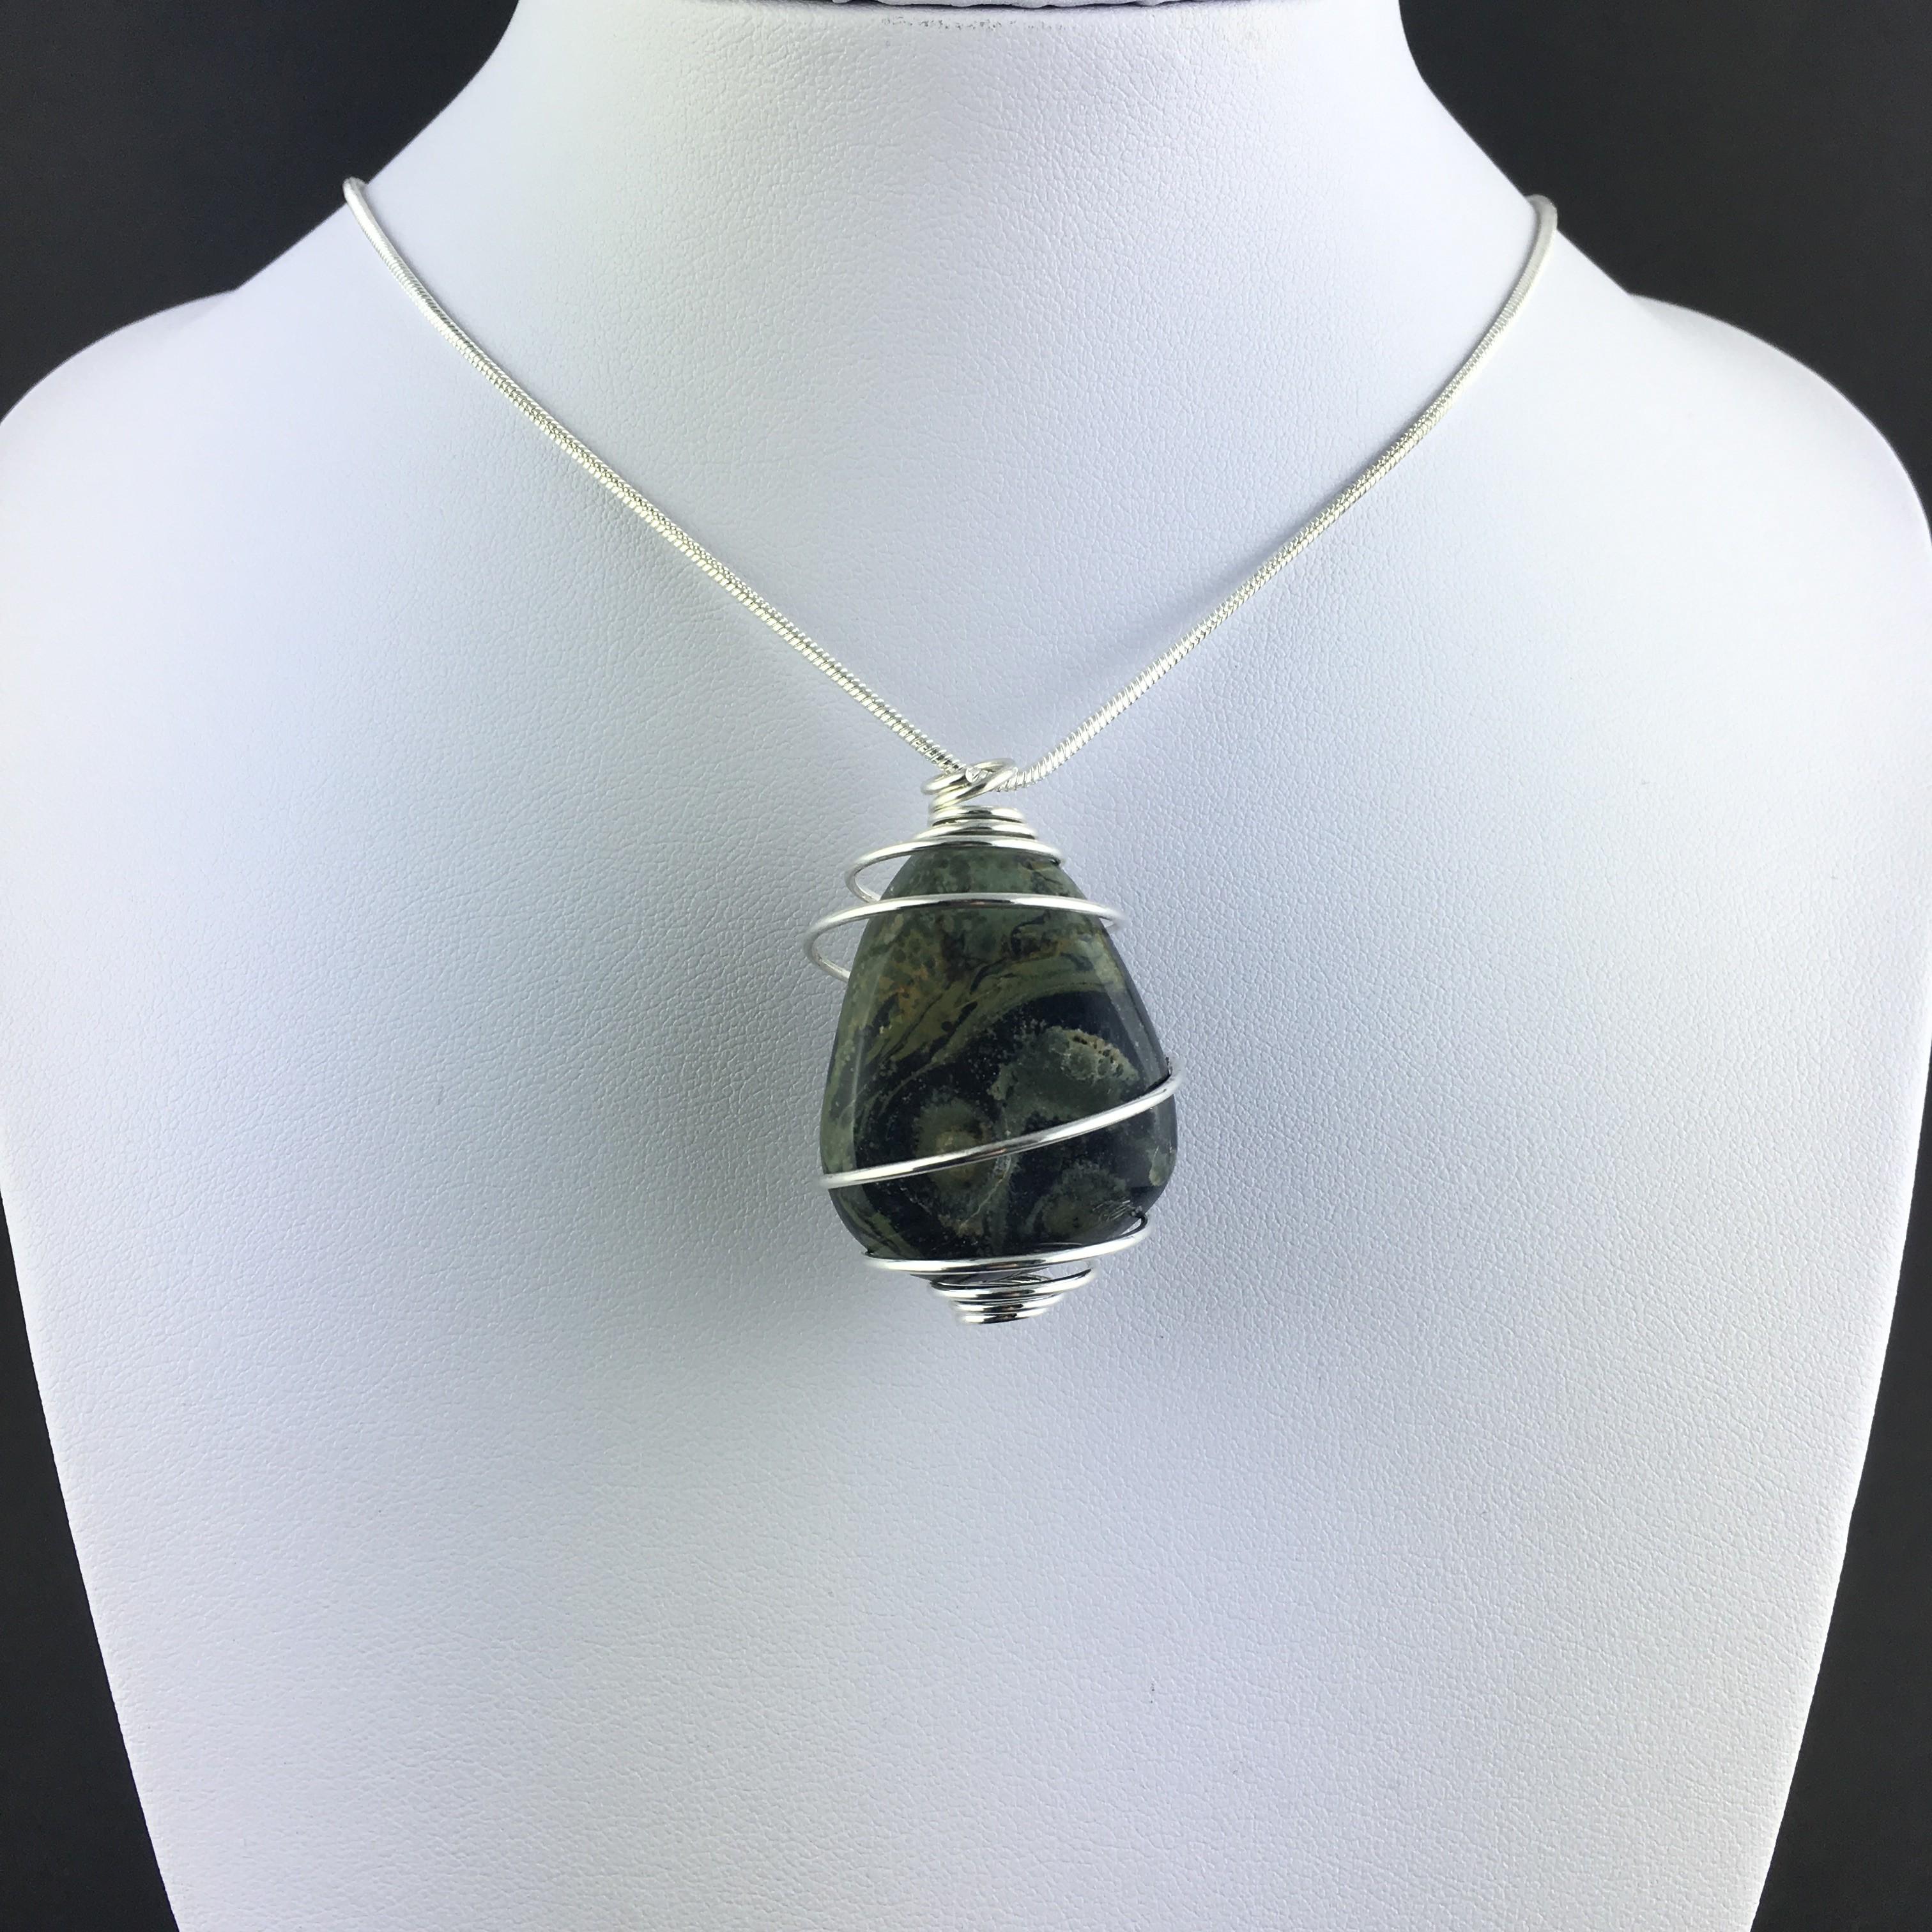 Unique lovely aventurine obelisk gemstone pendant silver plated necklace